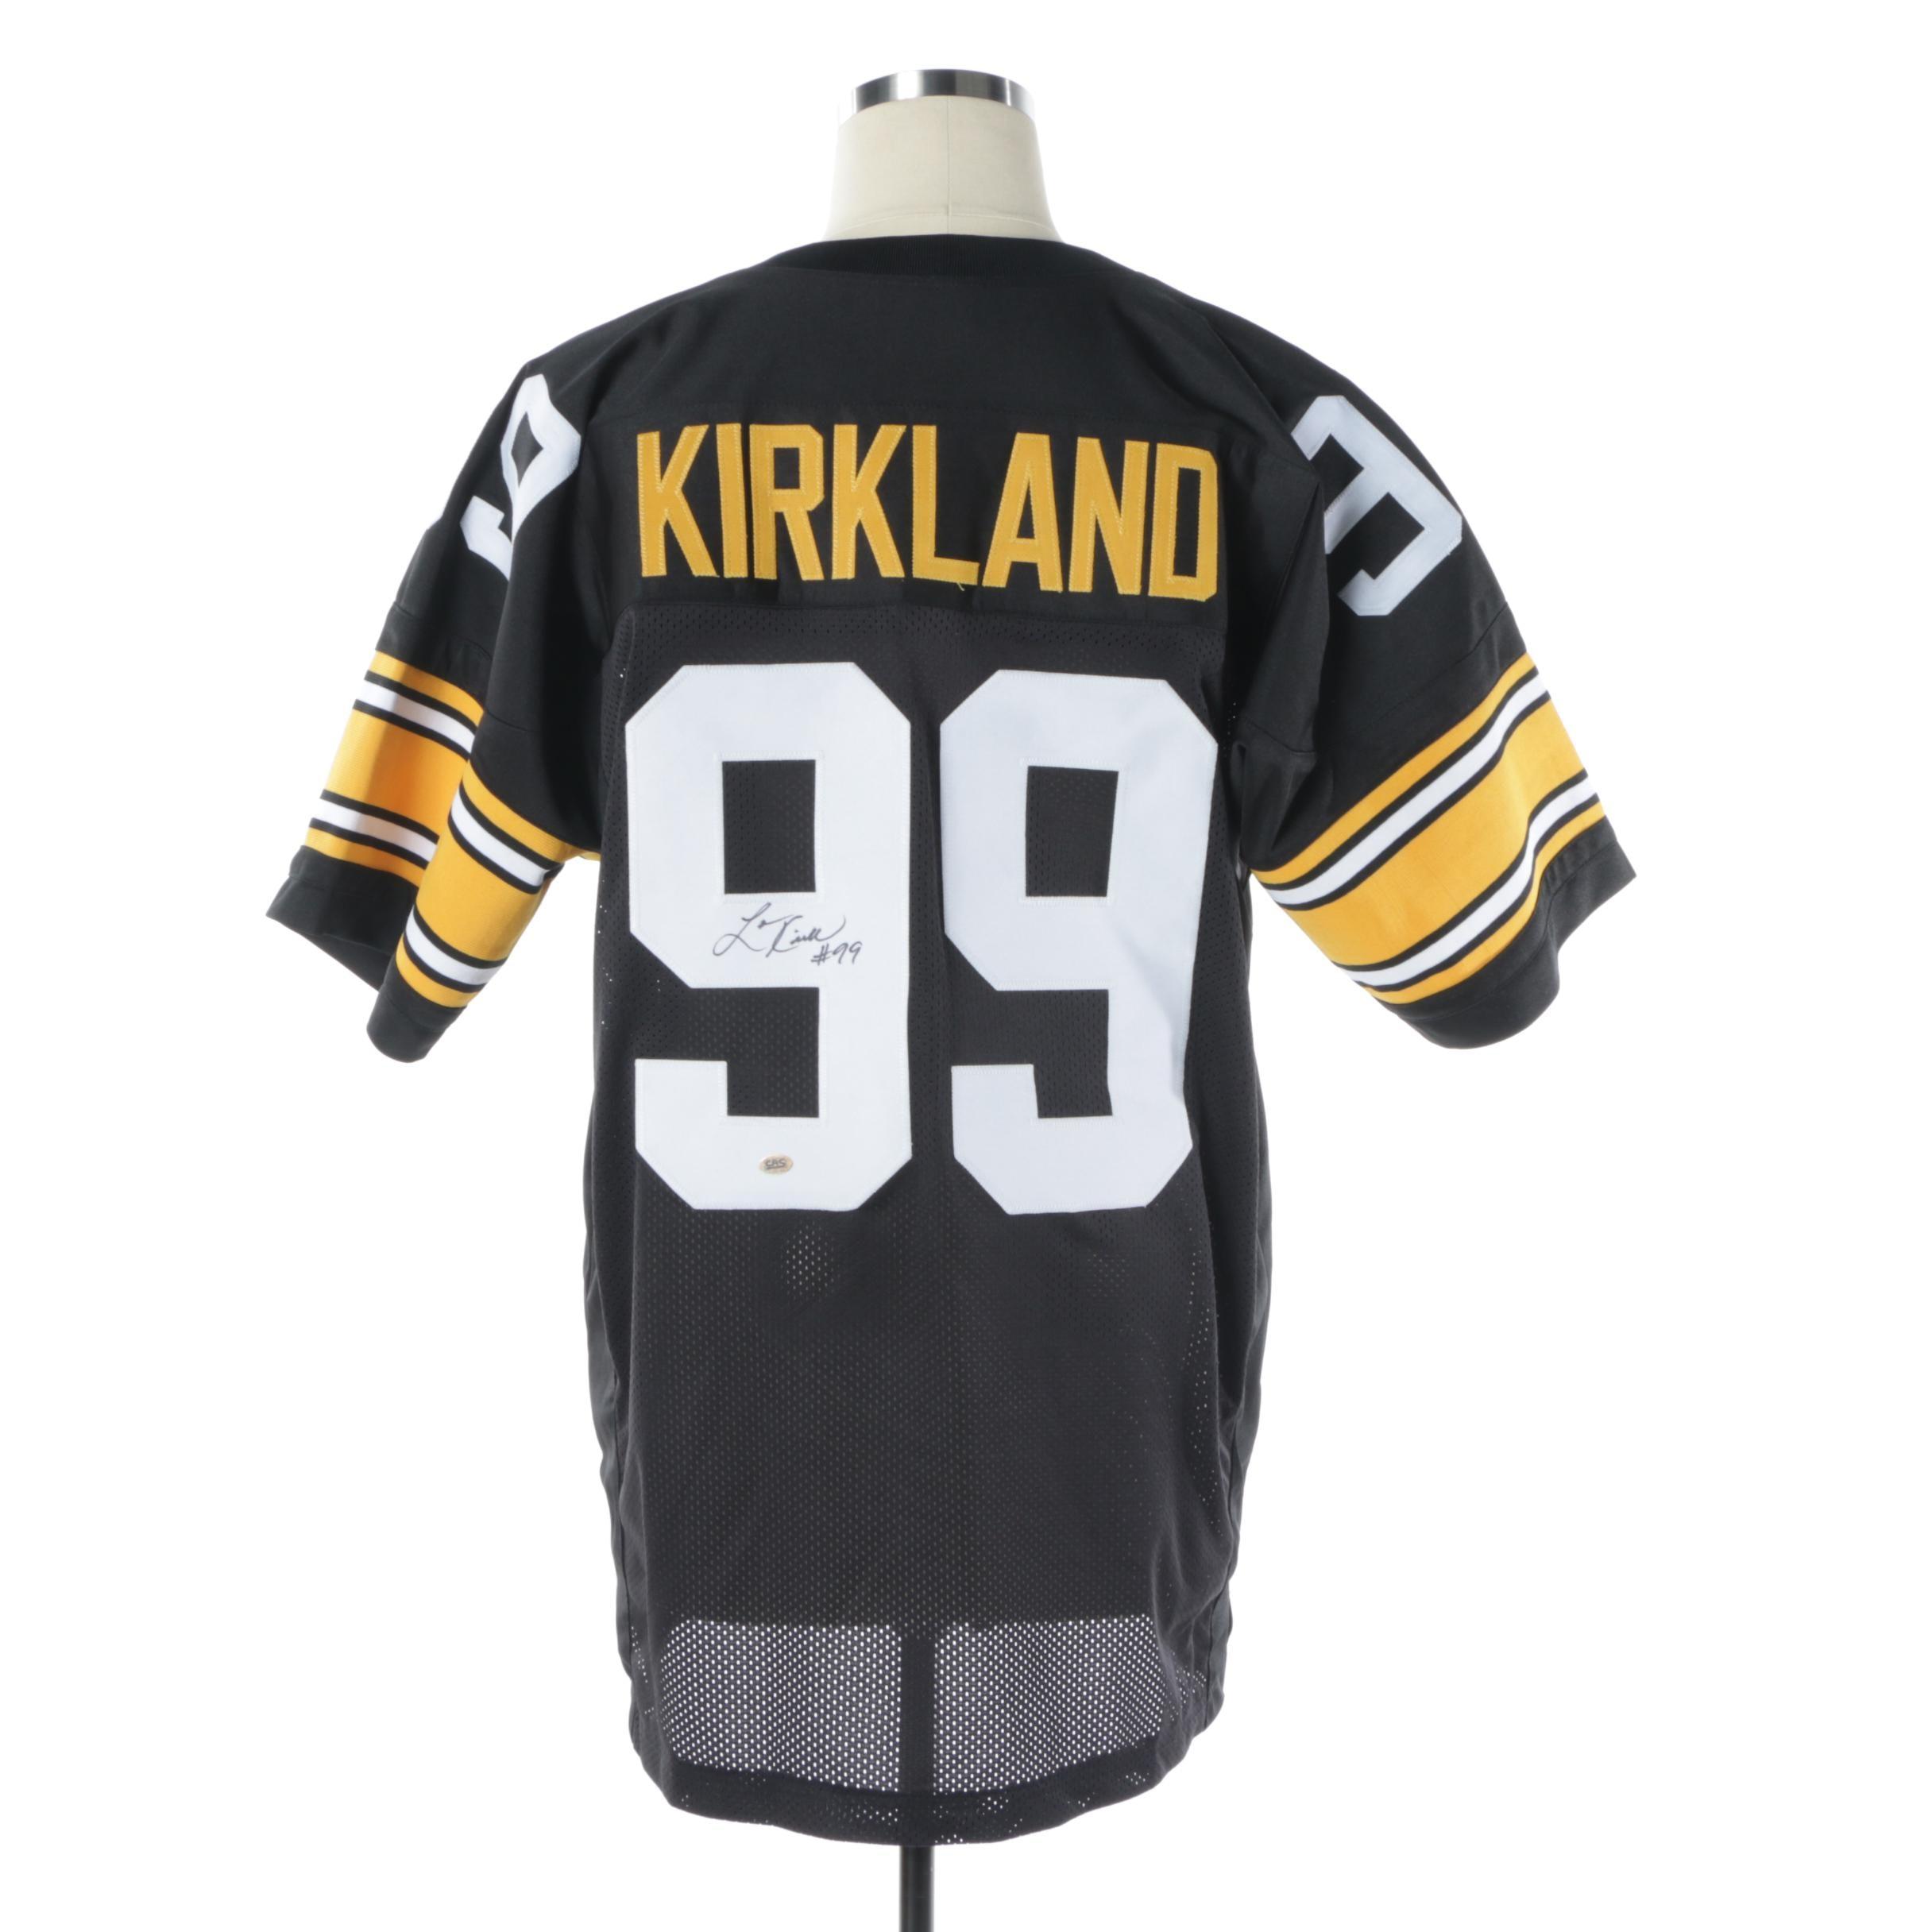 Levon Kirkland Autographed Pittsburgh Steelers Jersey